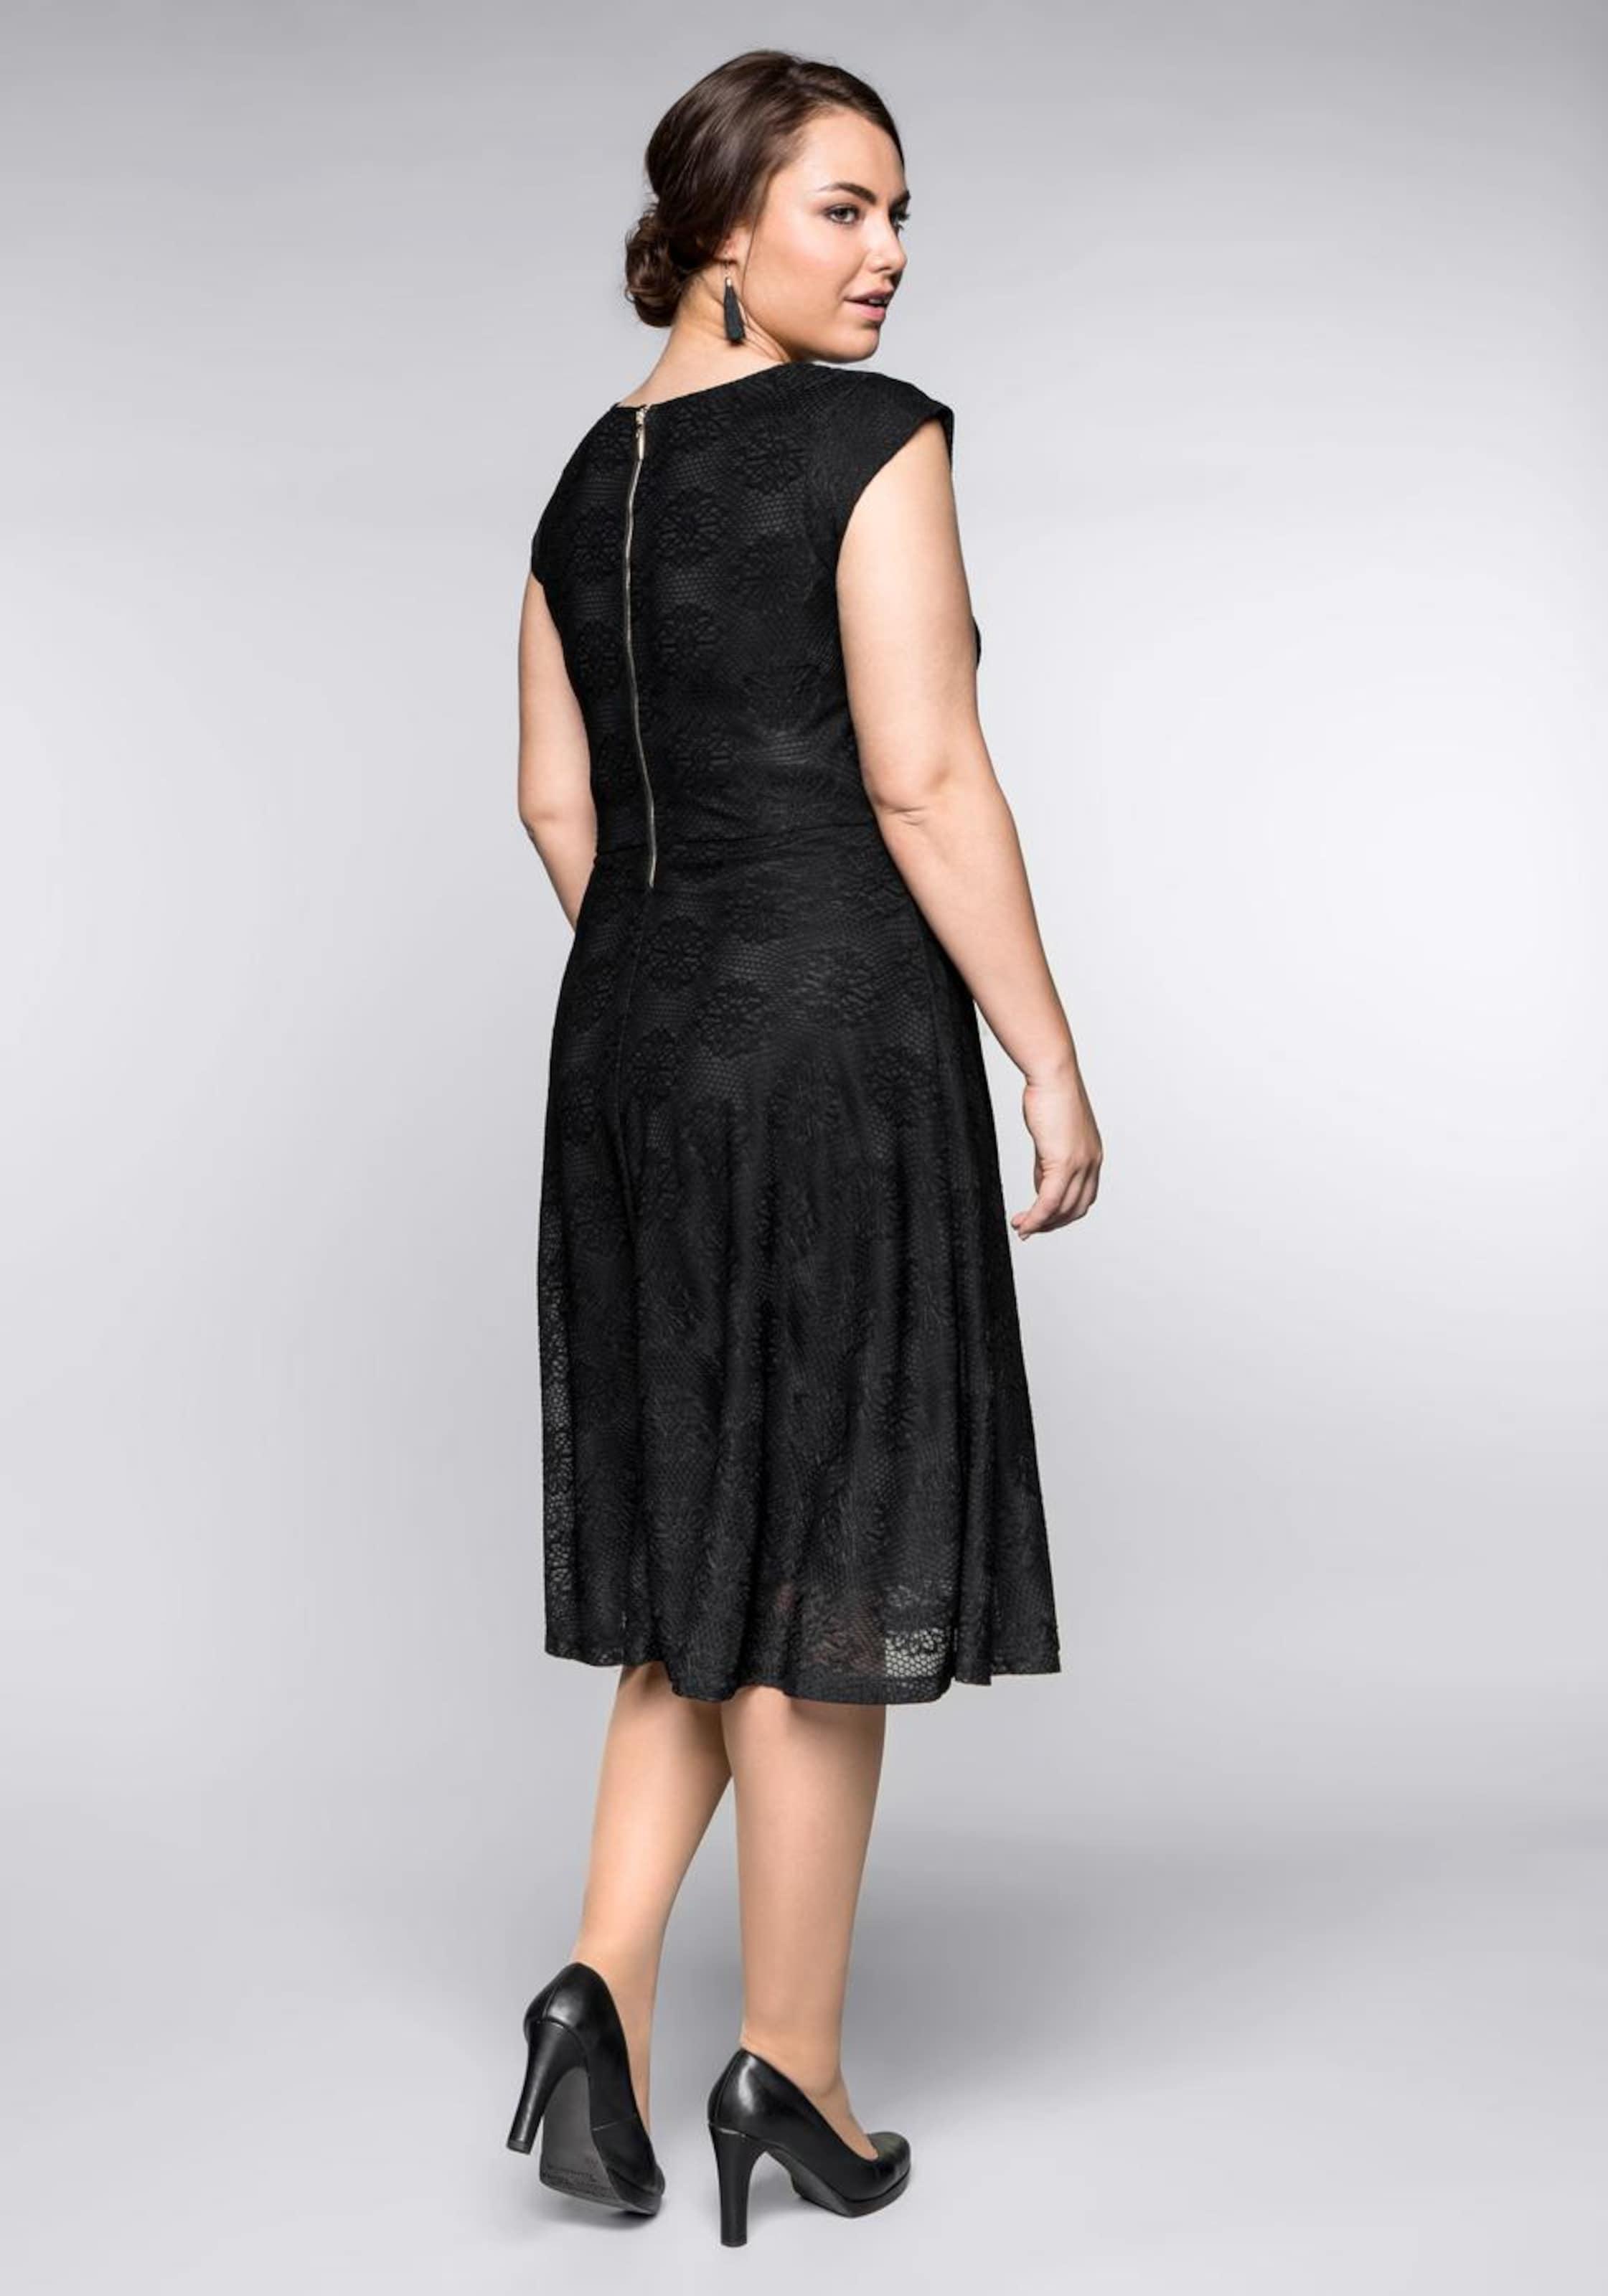 Style Kleid Sheego Style Sheego In In Schwarz Kleid qpSMUzV